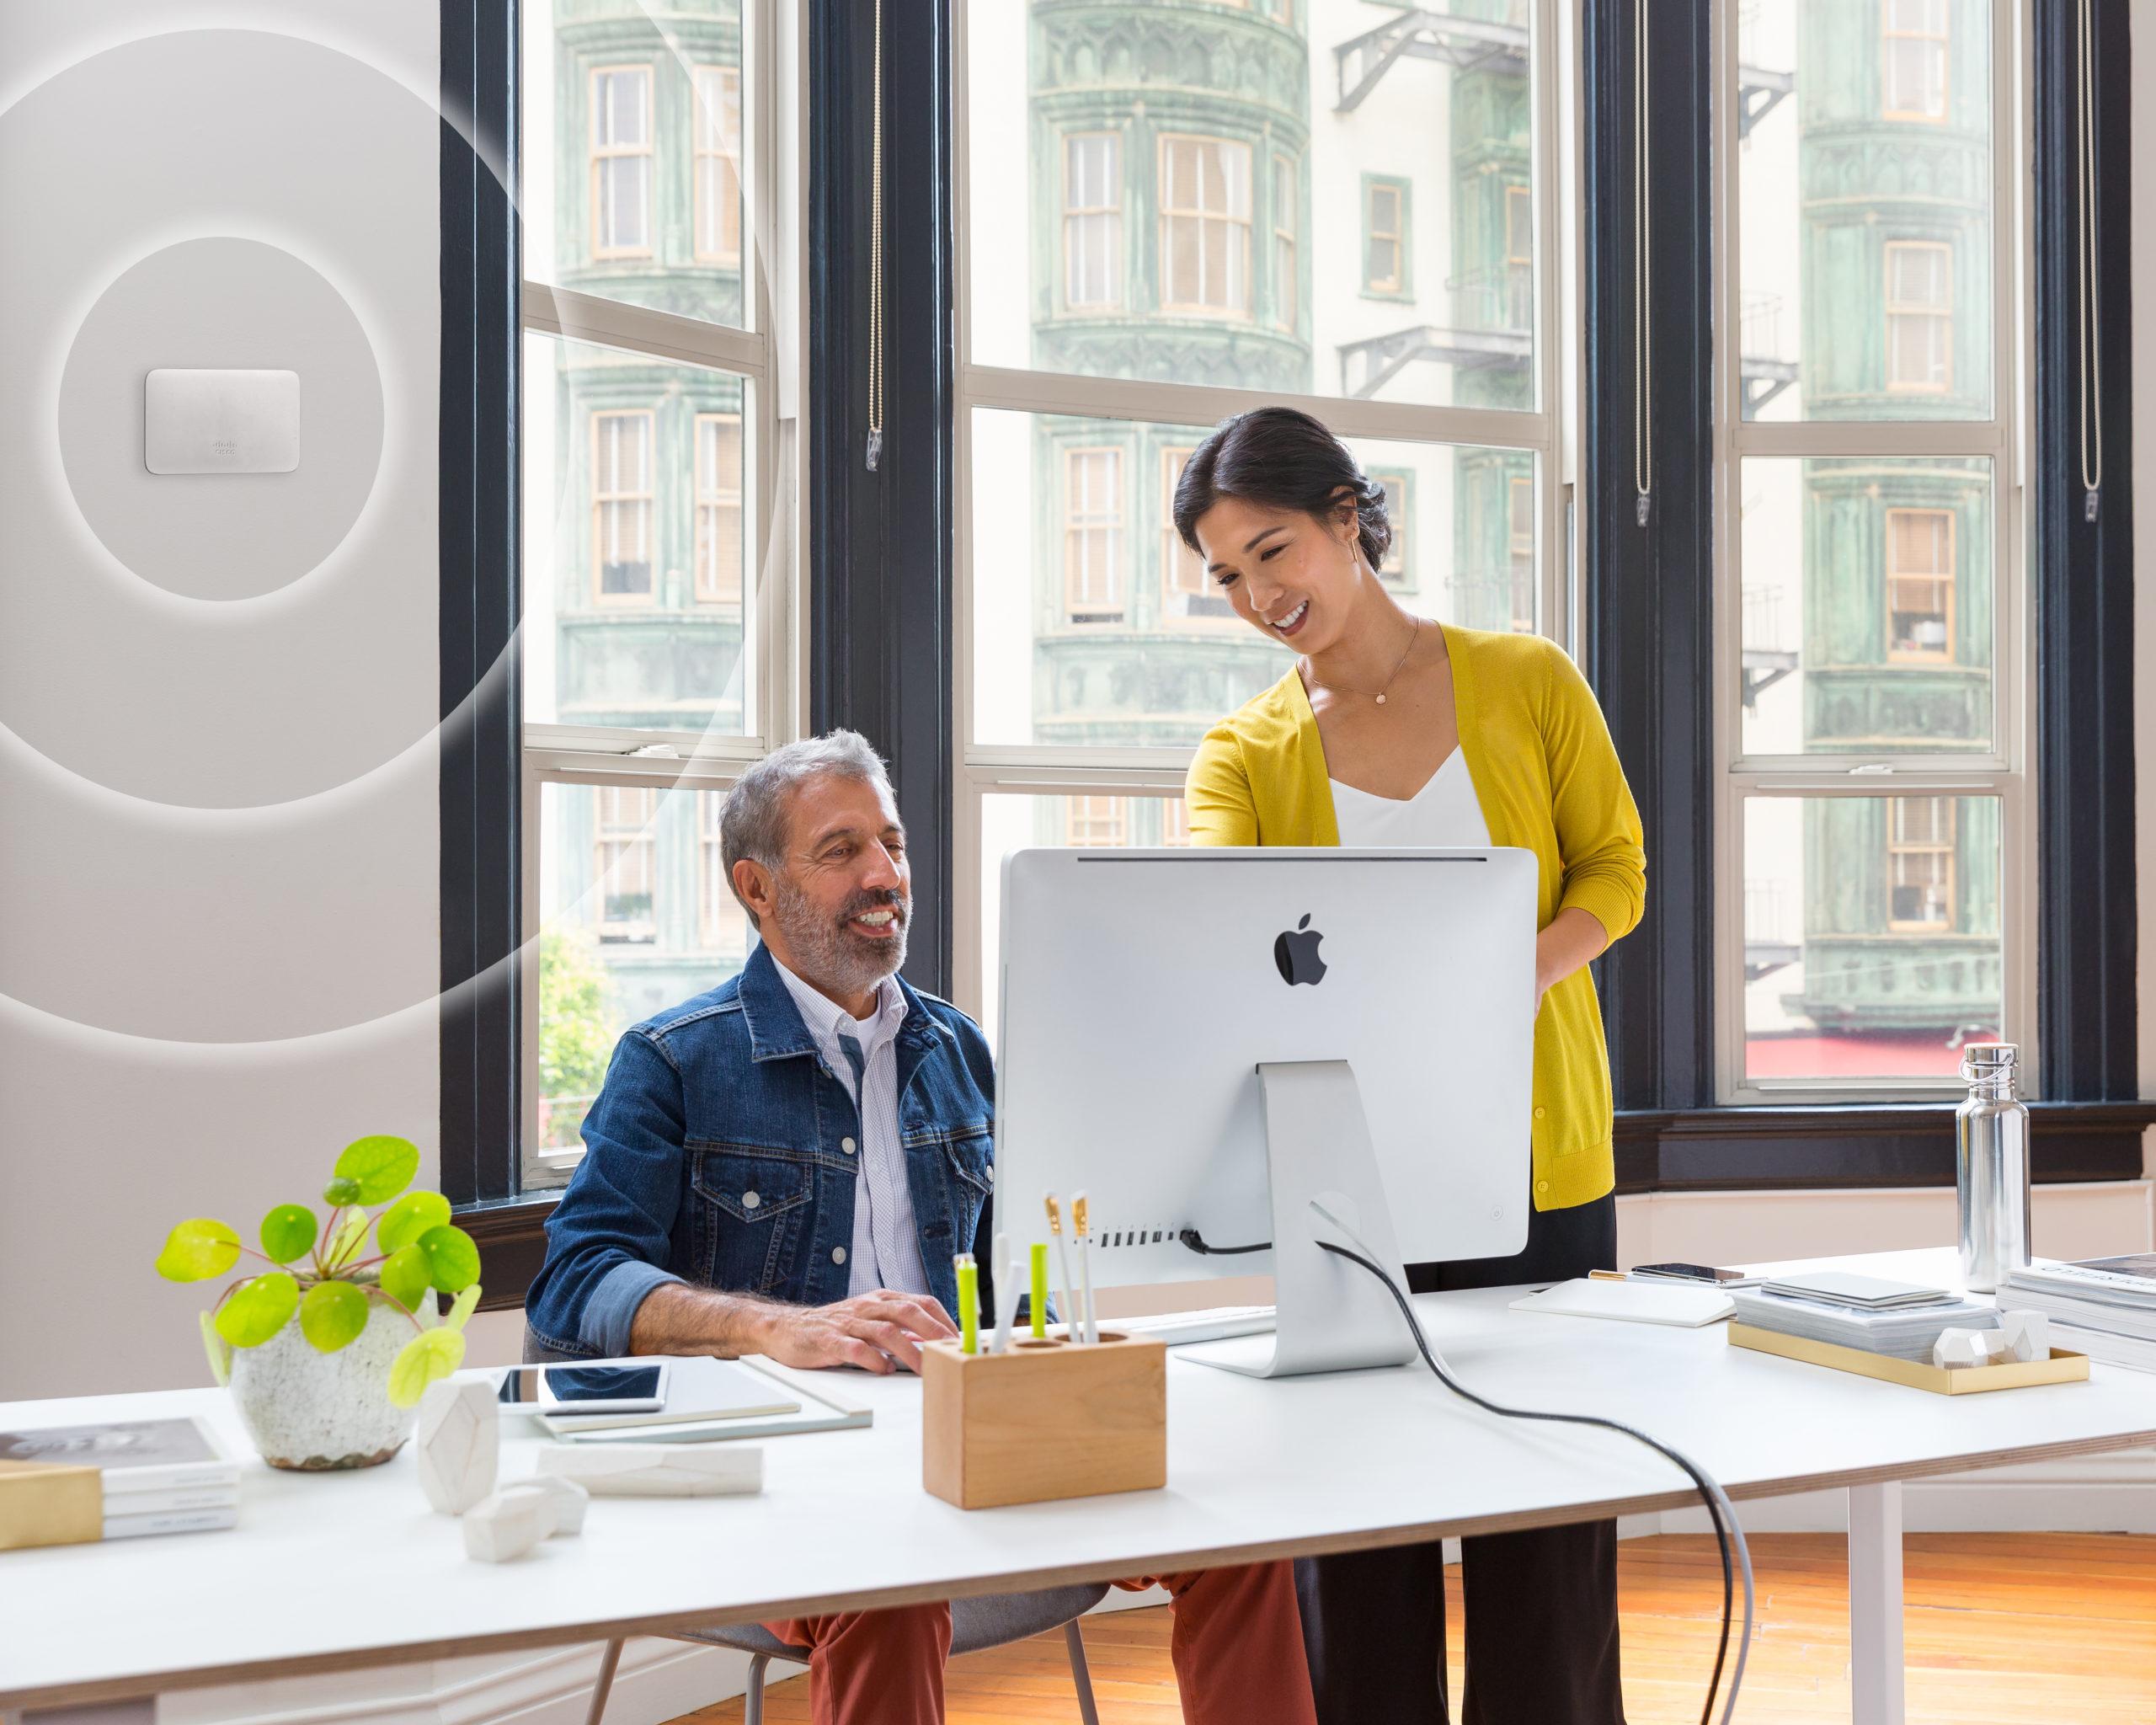 Man and woman at working looking at a computer screen